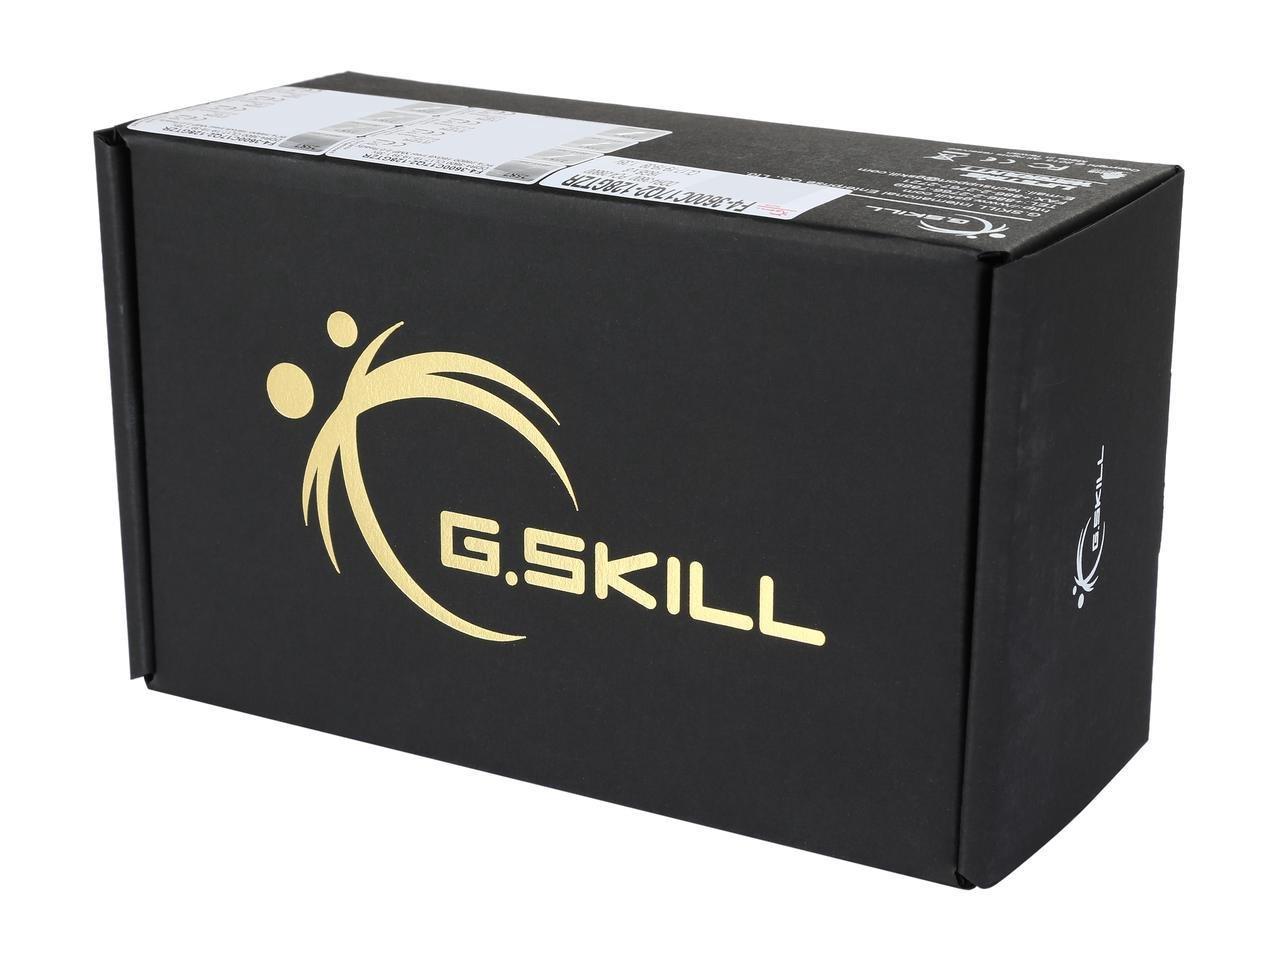 G.SKILL TridentZ RGB Series 128GB (8 x 16GB) 288-Pin DDR4 3333MHz DIMM F4-3333C16Q2-128GTZR by G.Skill (Image #4)